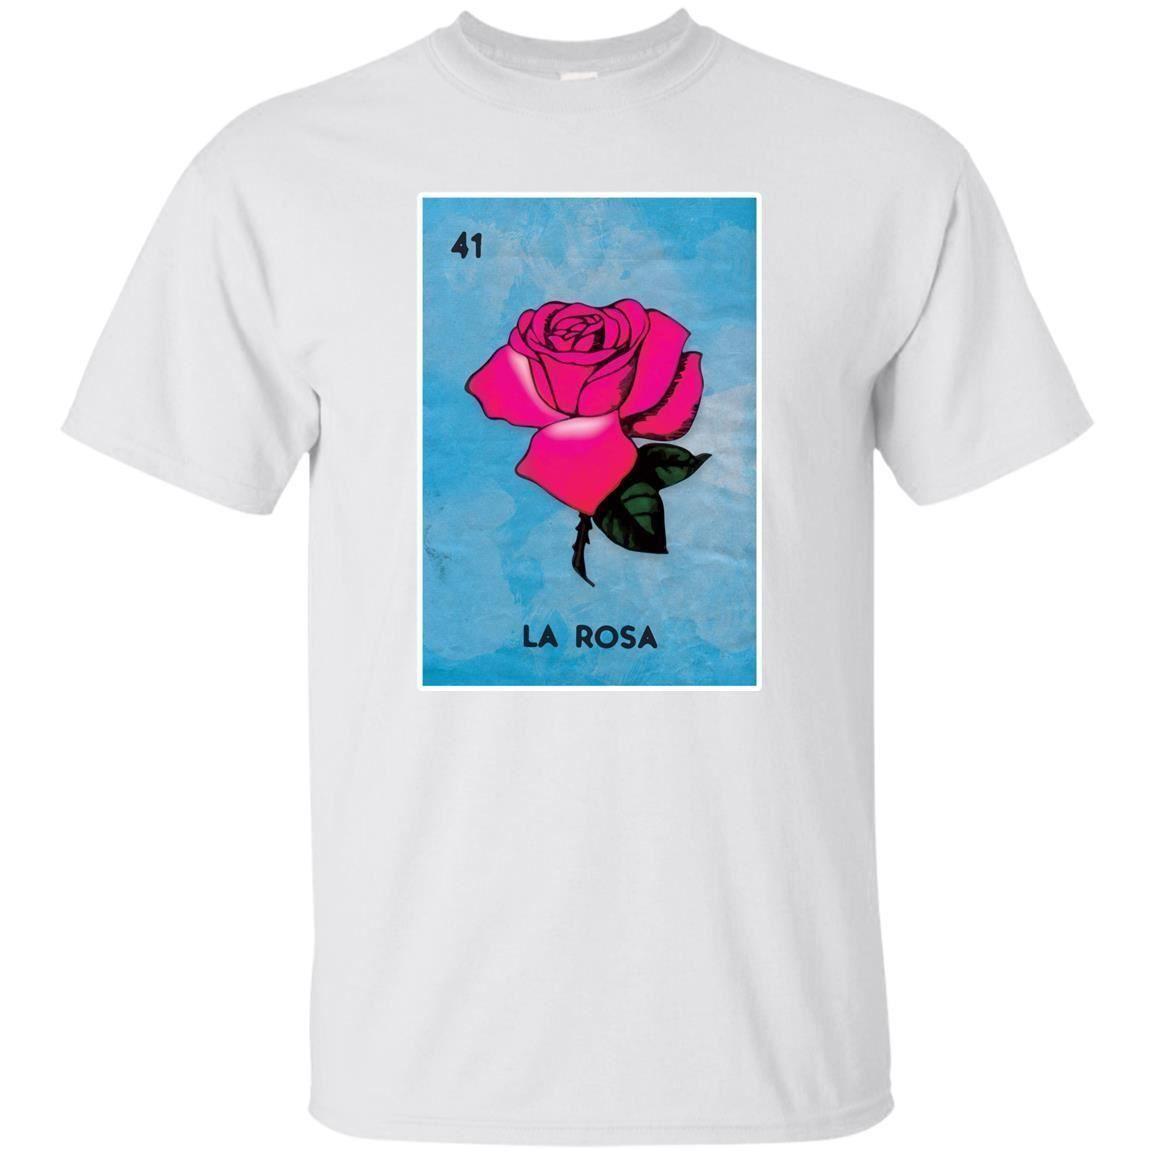 39299d7d Mexican Loteria Tshirts La Rosa Black Navy T Shirt Grunge Version Full Size  Summer Hot Sale New Tee Print Men T Shirt Top 100% Cotton Funny Political T  ...